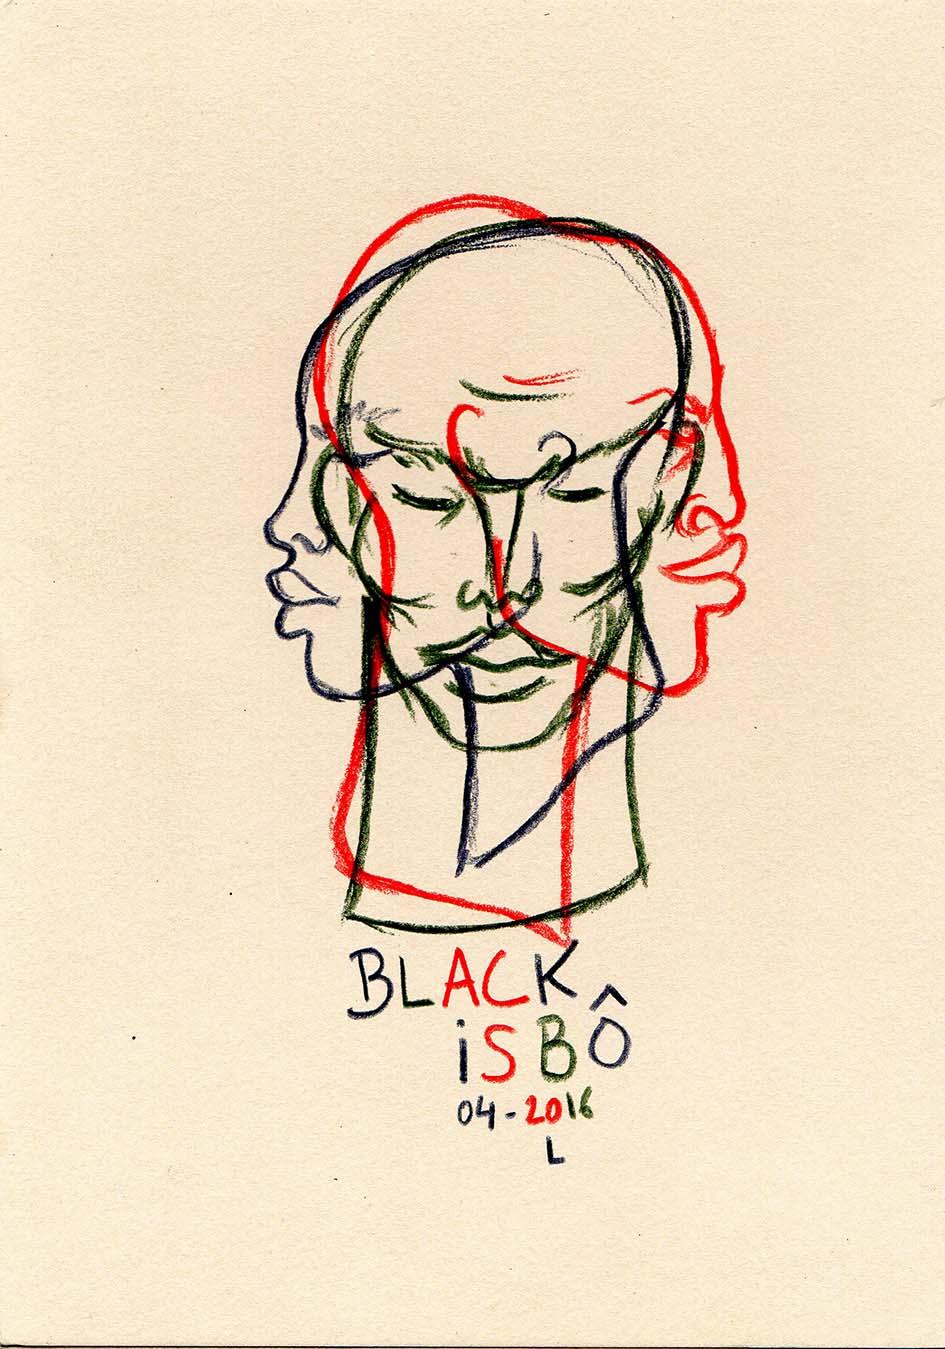 201604_BlackIsBô_200_Lorentino